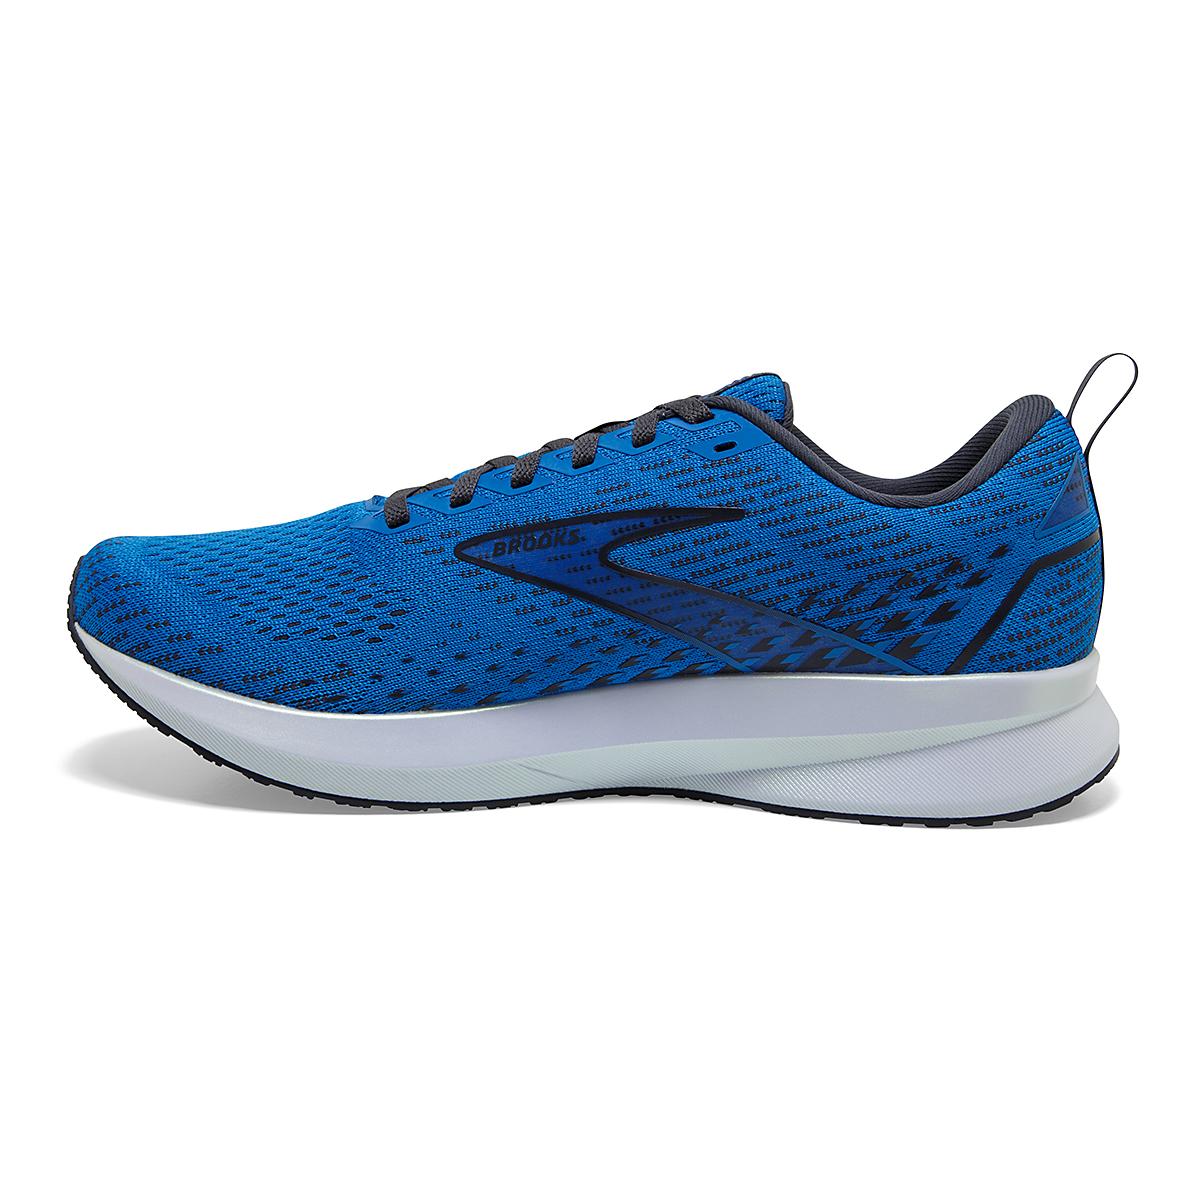 Men's Brooks Levitate 5 Running Shoe - Color: Blue/India Ink/White - Size: 7 - Width: Regular, Blue/India Ink/White, large, image 4